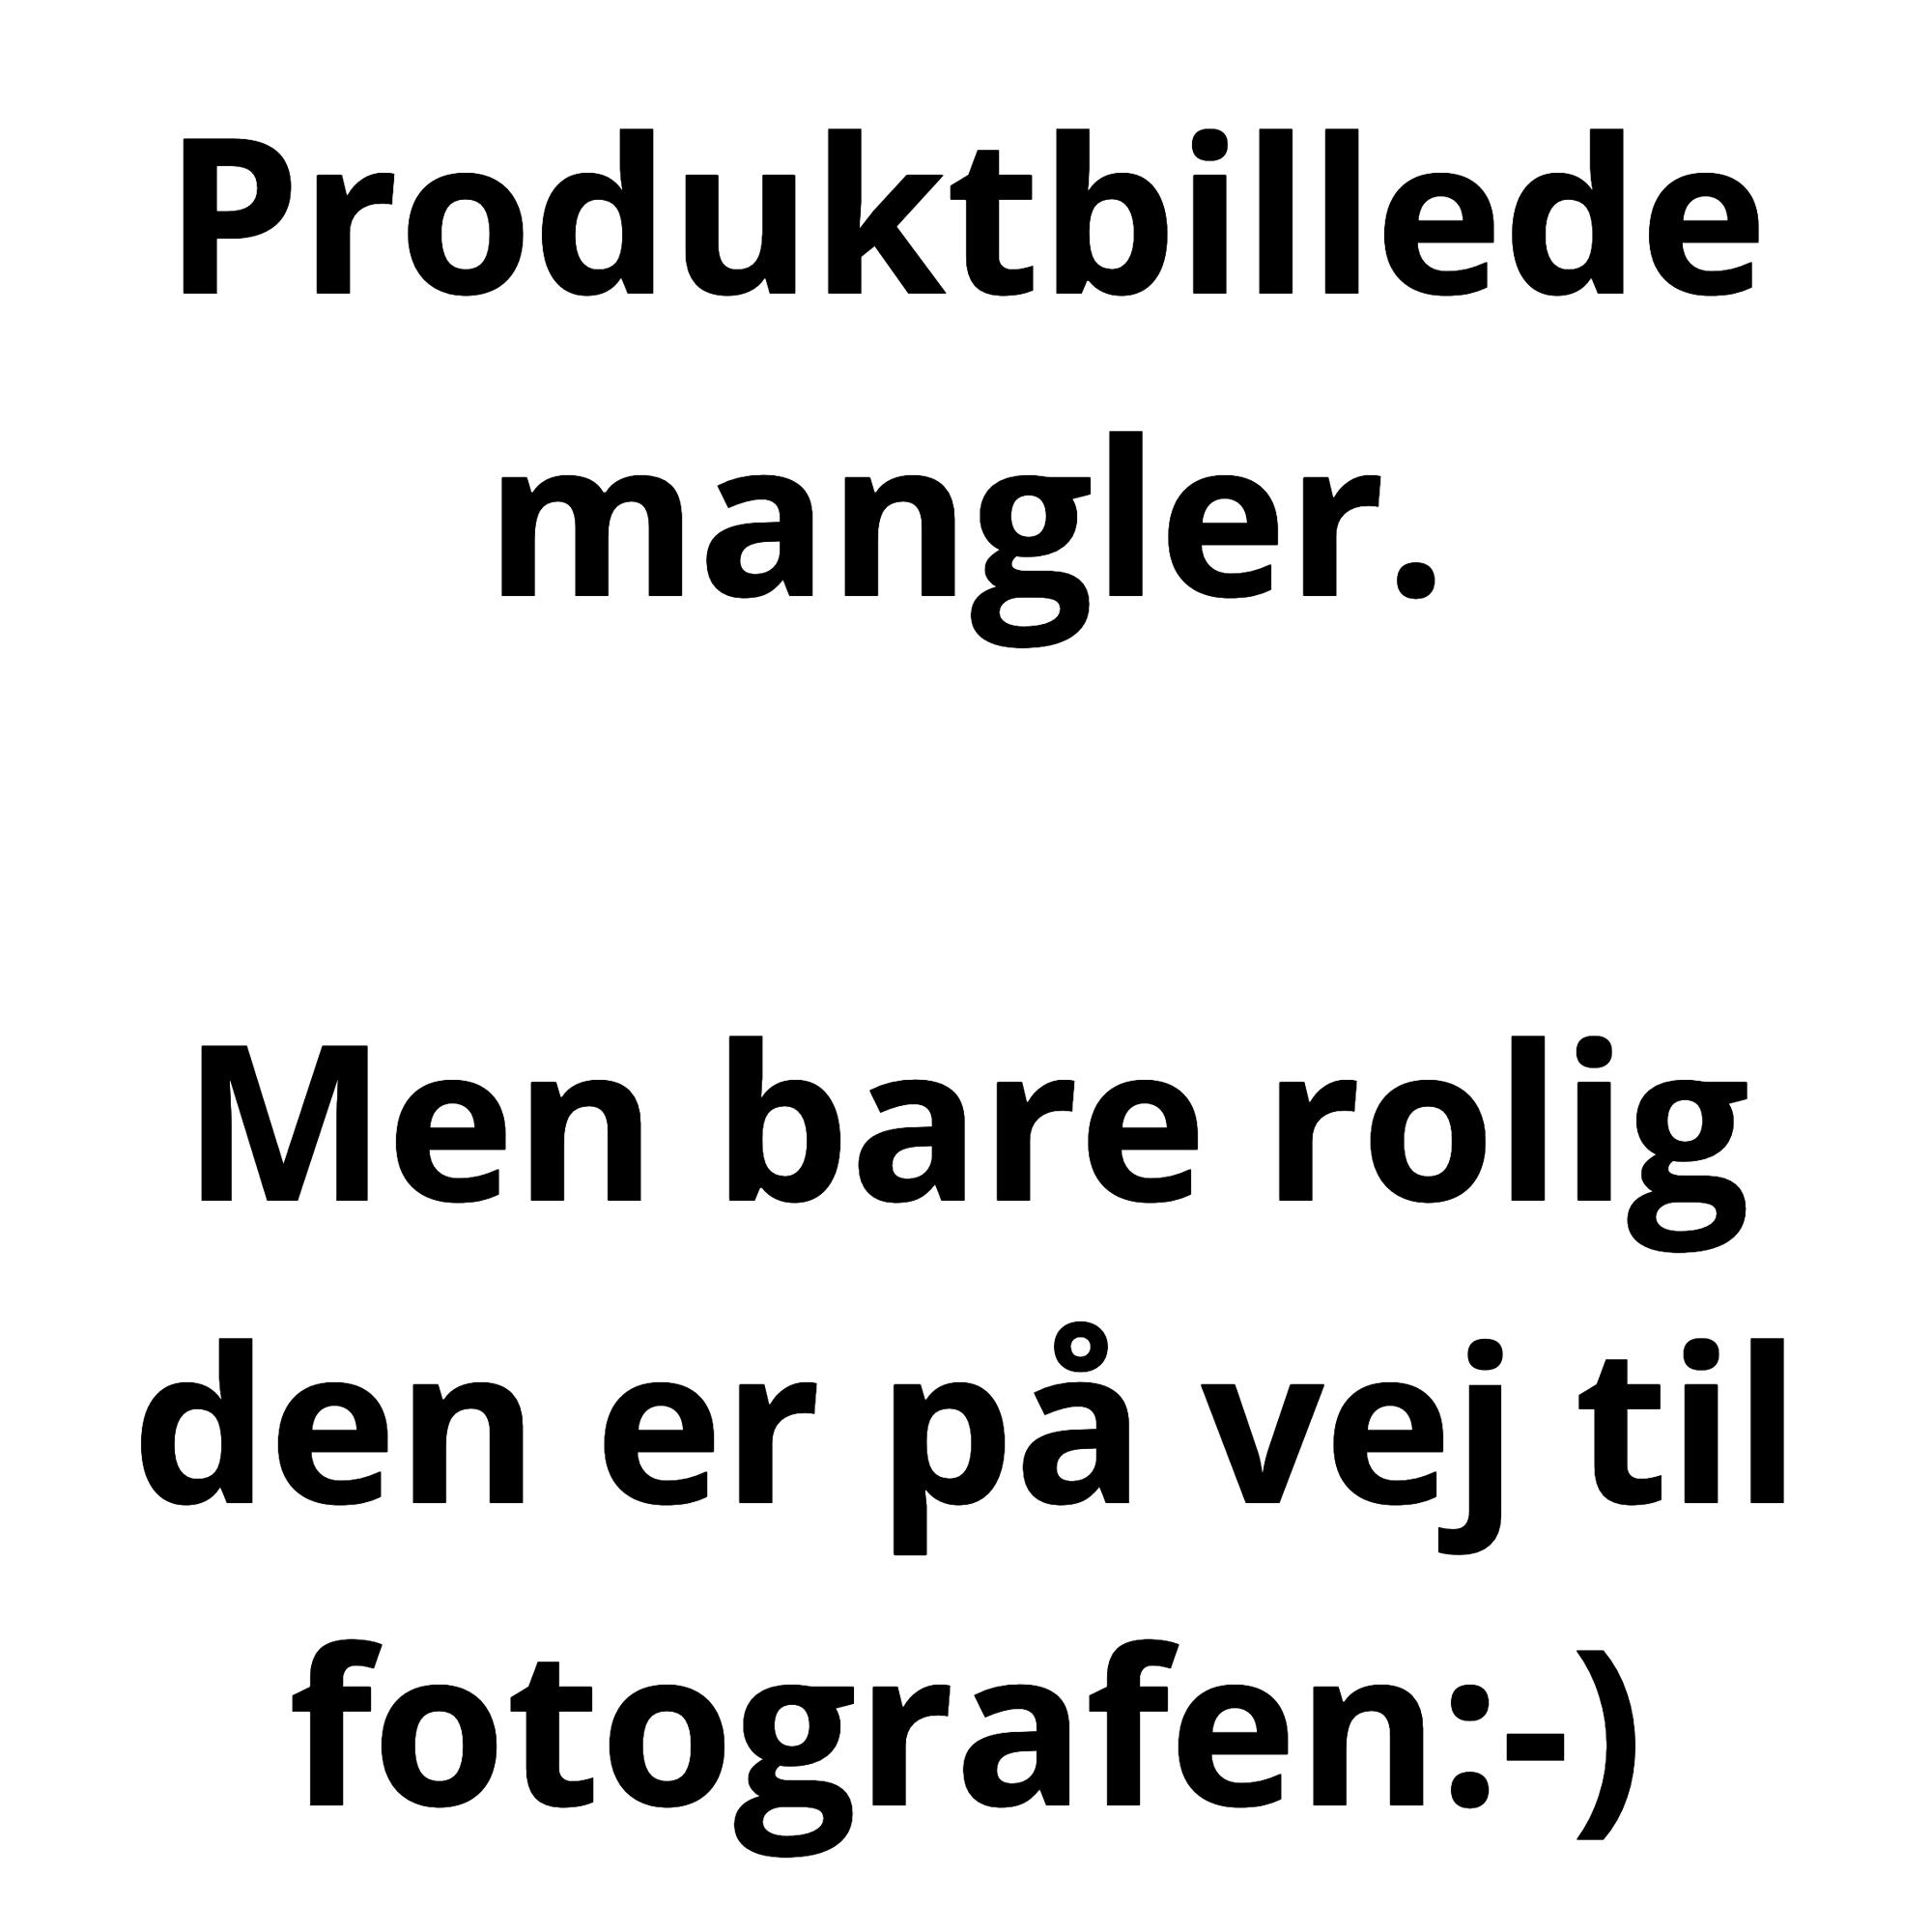 "Case Mate Beskyttelsesfolie til Apple iPhone 6 Plus/6S Plus (5,5"") - 2 stk."